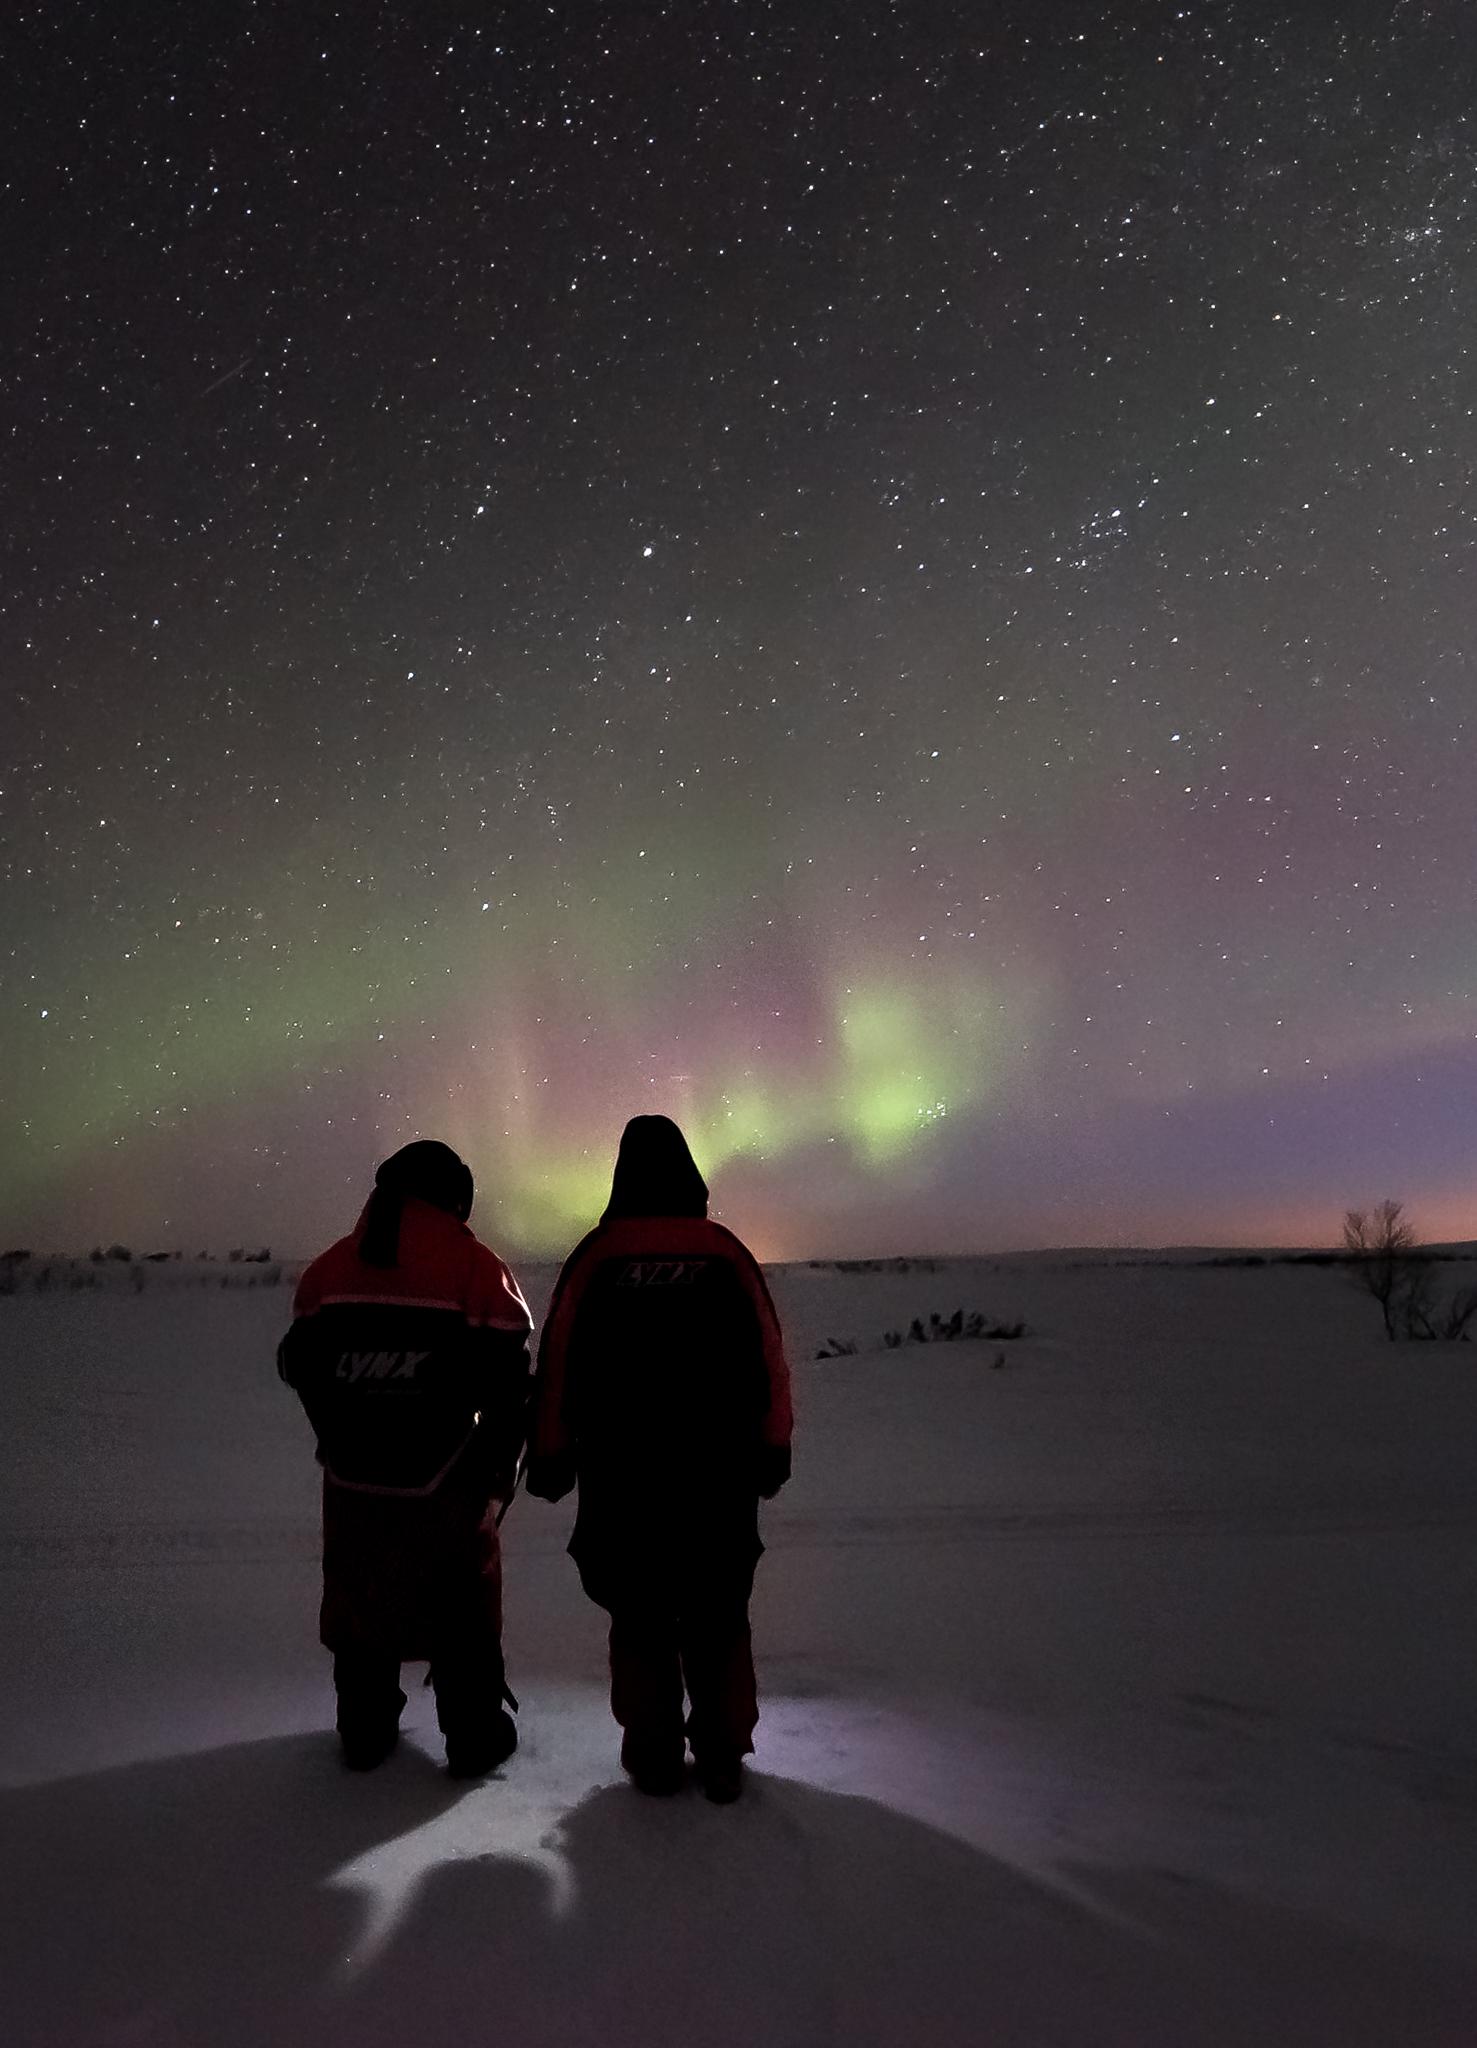 Aurora Borealis at Pöyrisjärvi